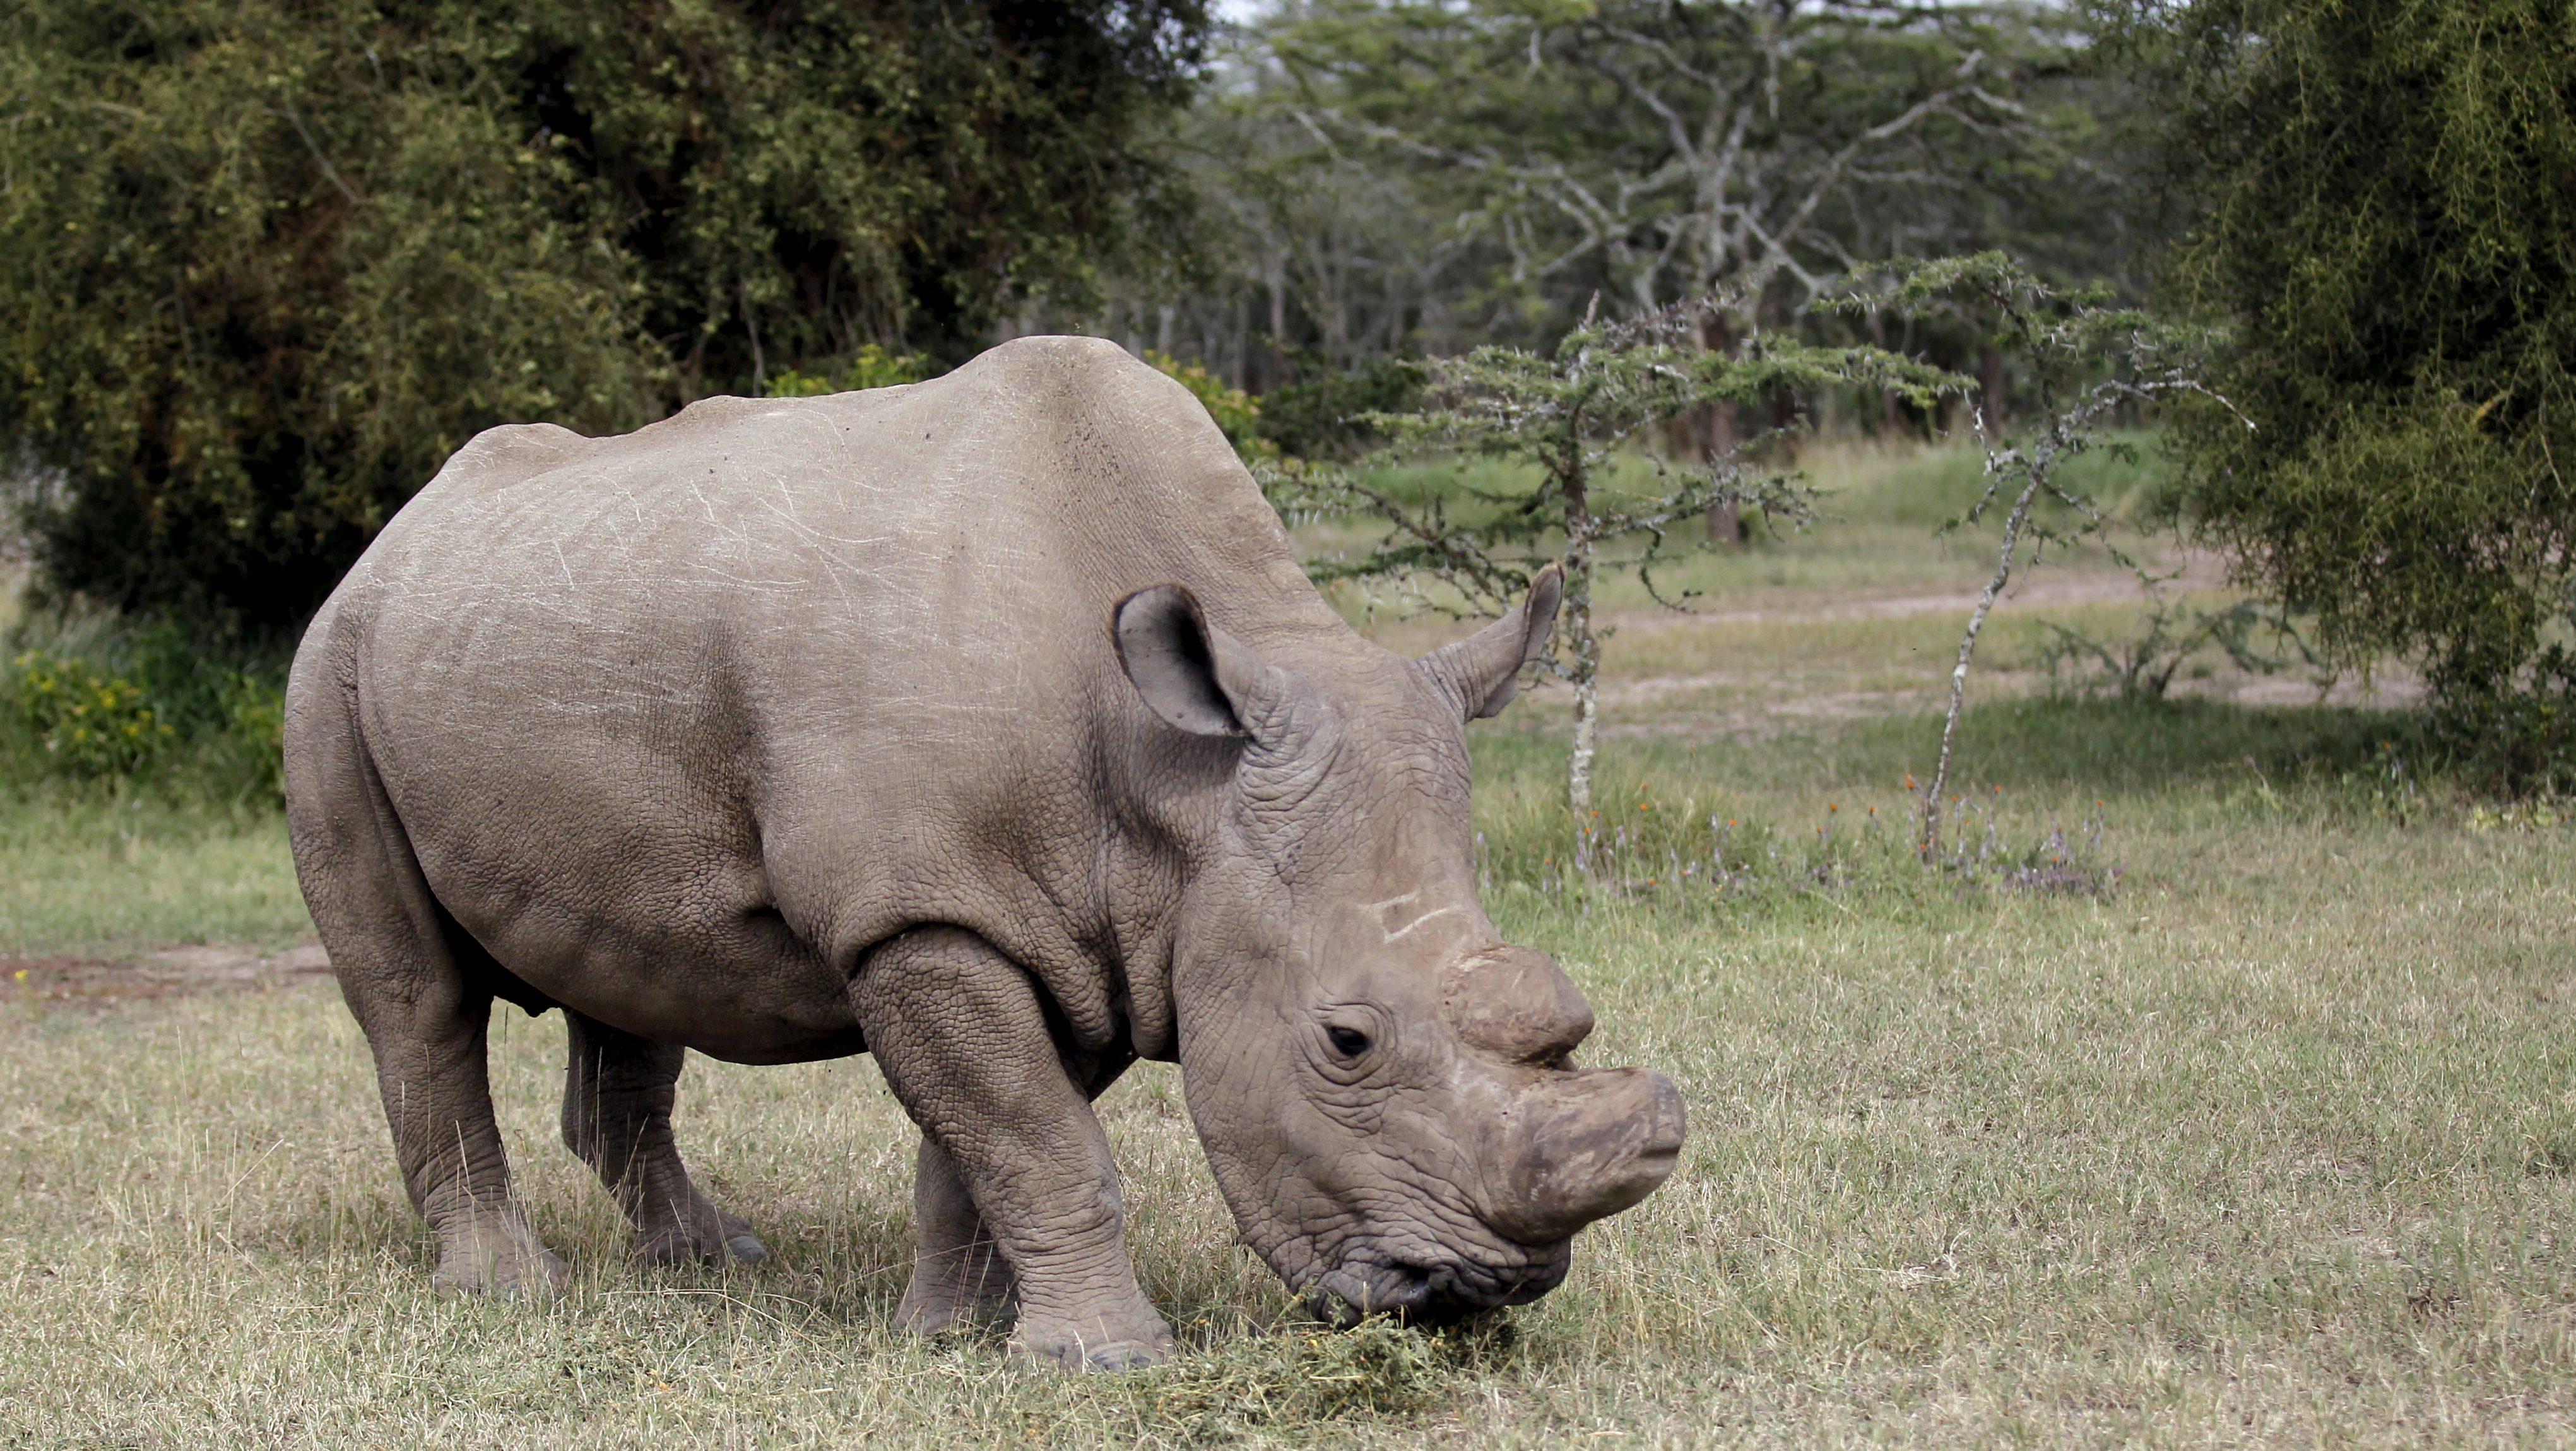 The last surviving male northern white rhino named 'Sudan' grazes at the Ol Pejeta Conservancy in Laikipia national park, Kenya June 14, 2015.